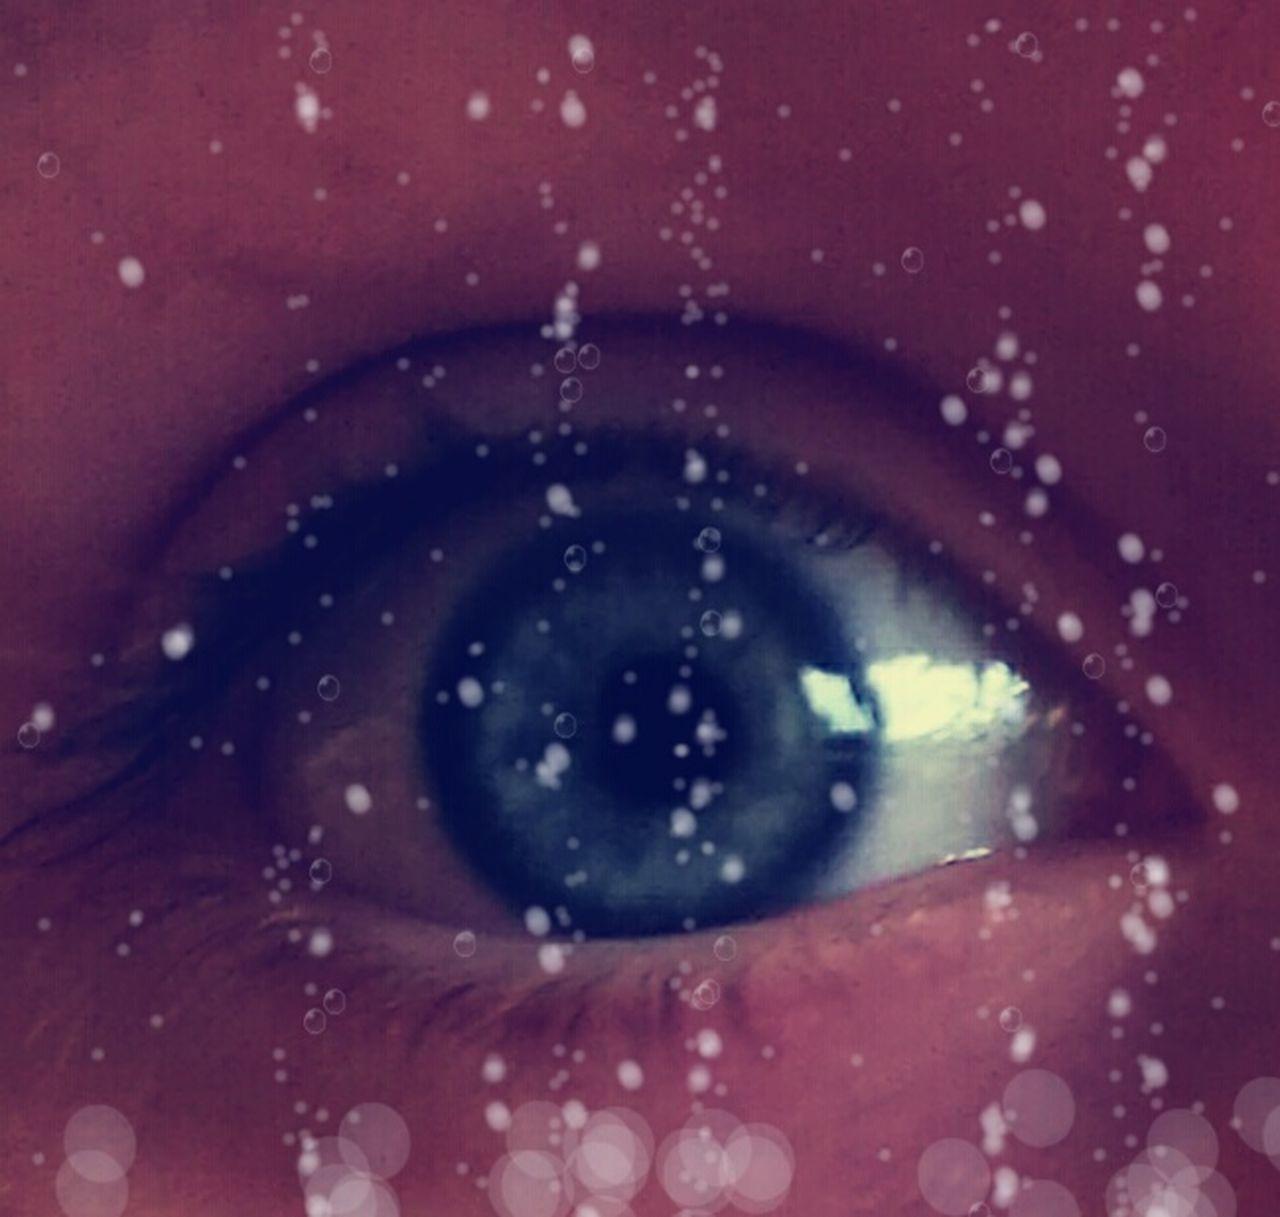 human eye, human body part, one person, real people, sensory perception, close-up, eyelash, eyesight, looking at camera, eyeball, portrait, iris - eye, indoors, day, people